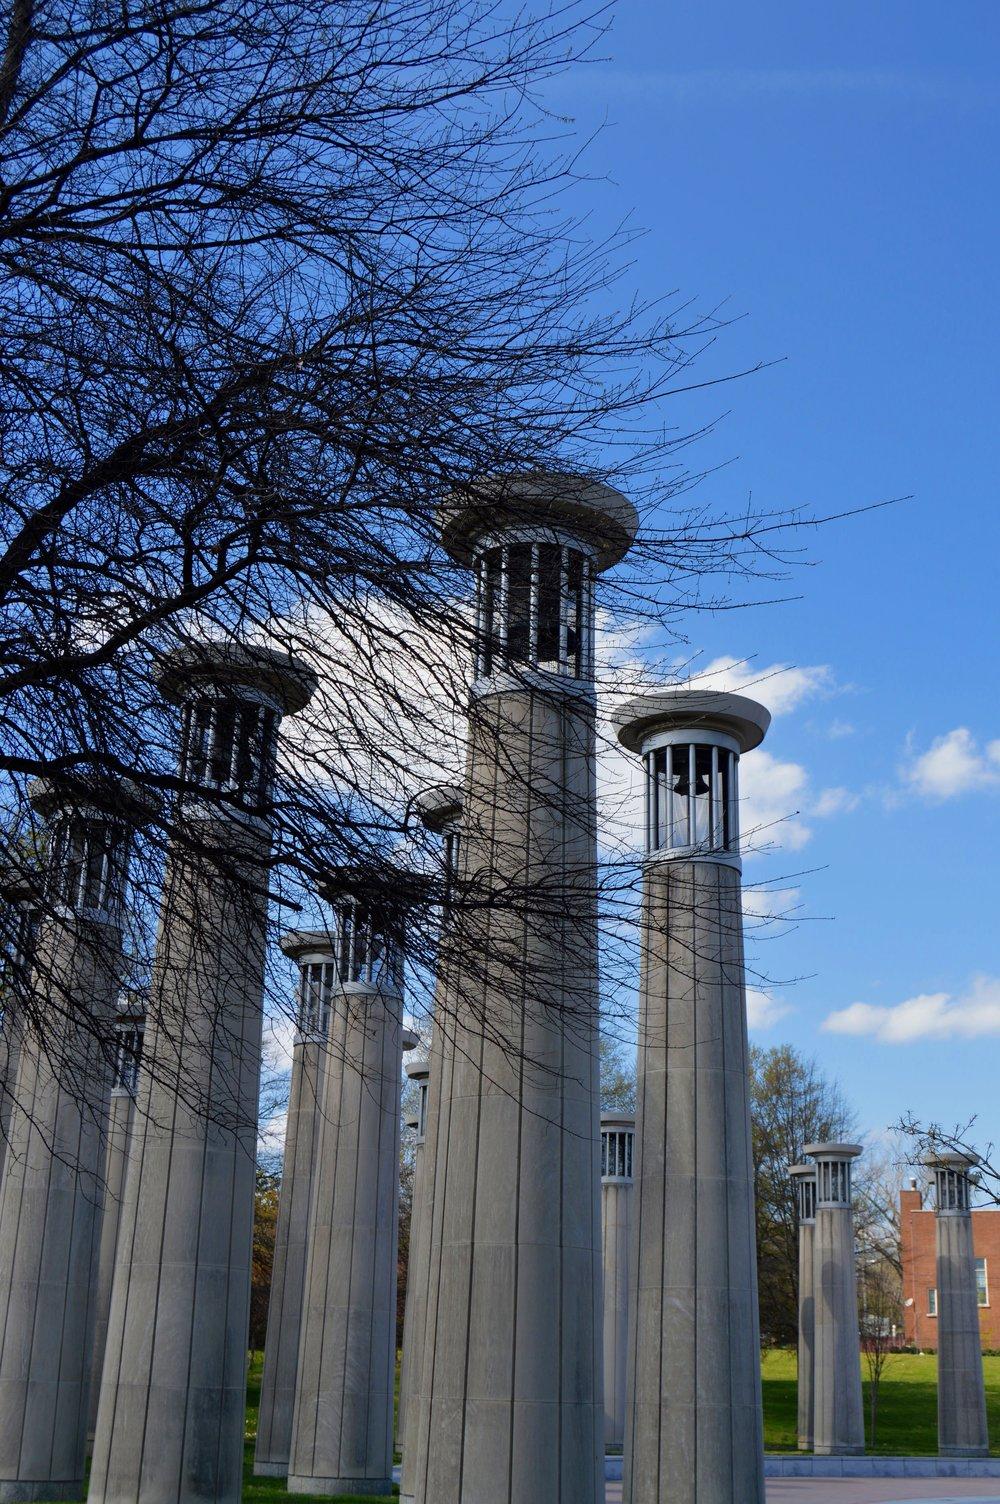 Carillon at Bicentennial Mall